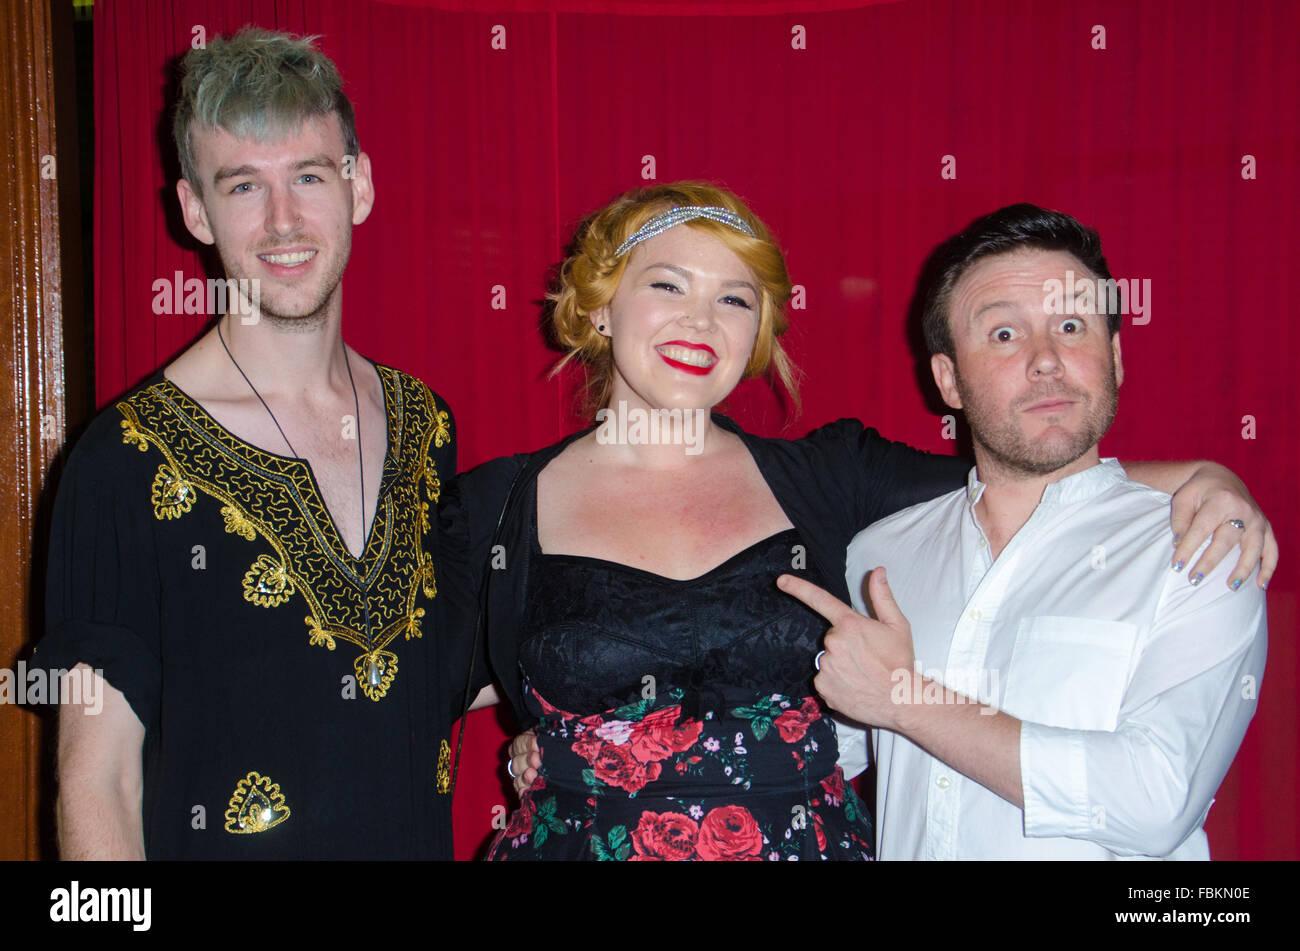 Sydney, Australia - 18th January 2016: VIP's and Celebrities arrive at Paddington RSL for the Sydney Theatre - Stock Image